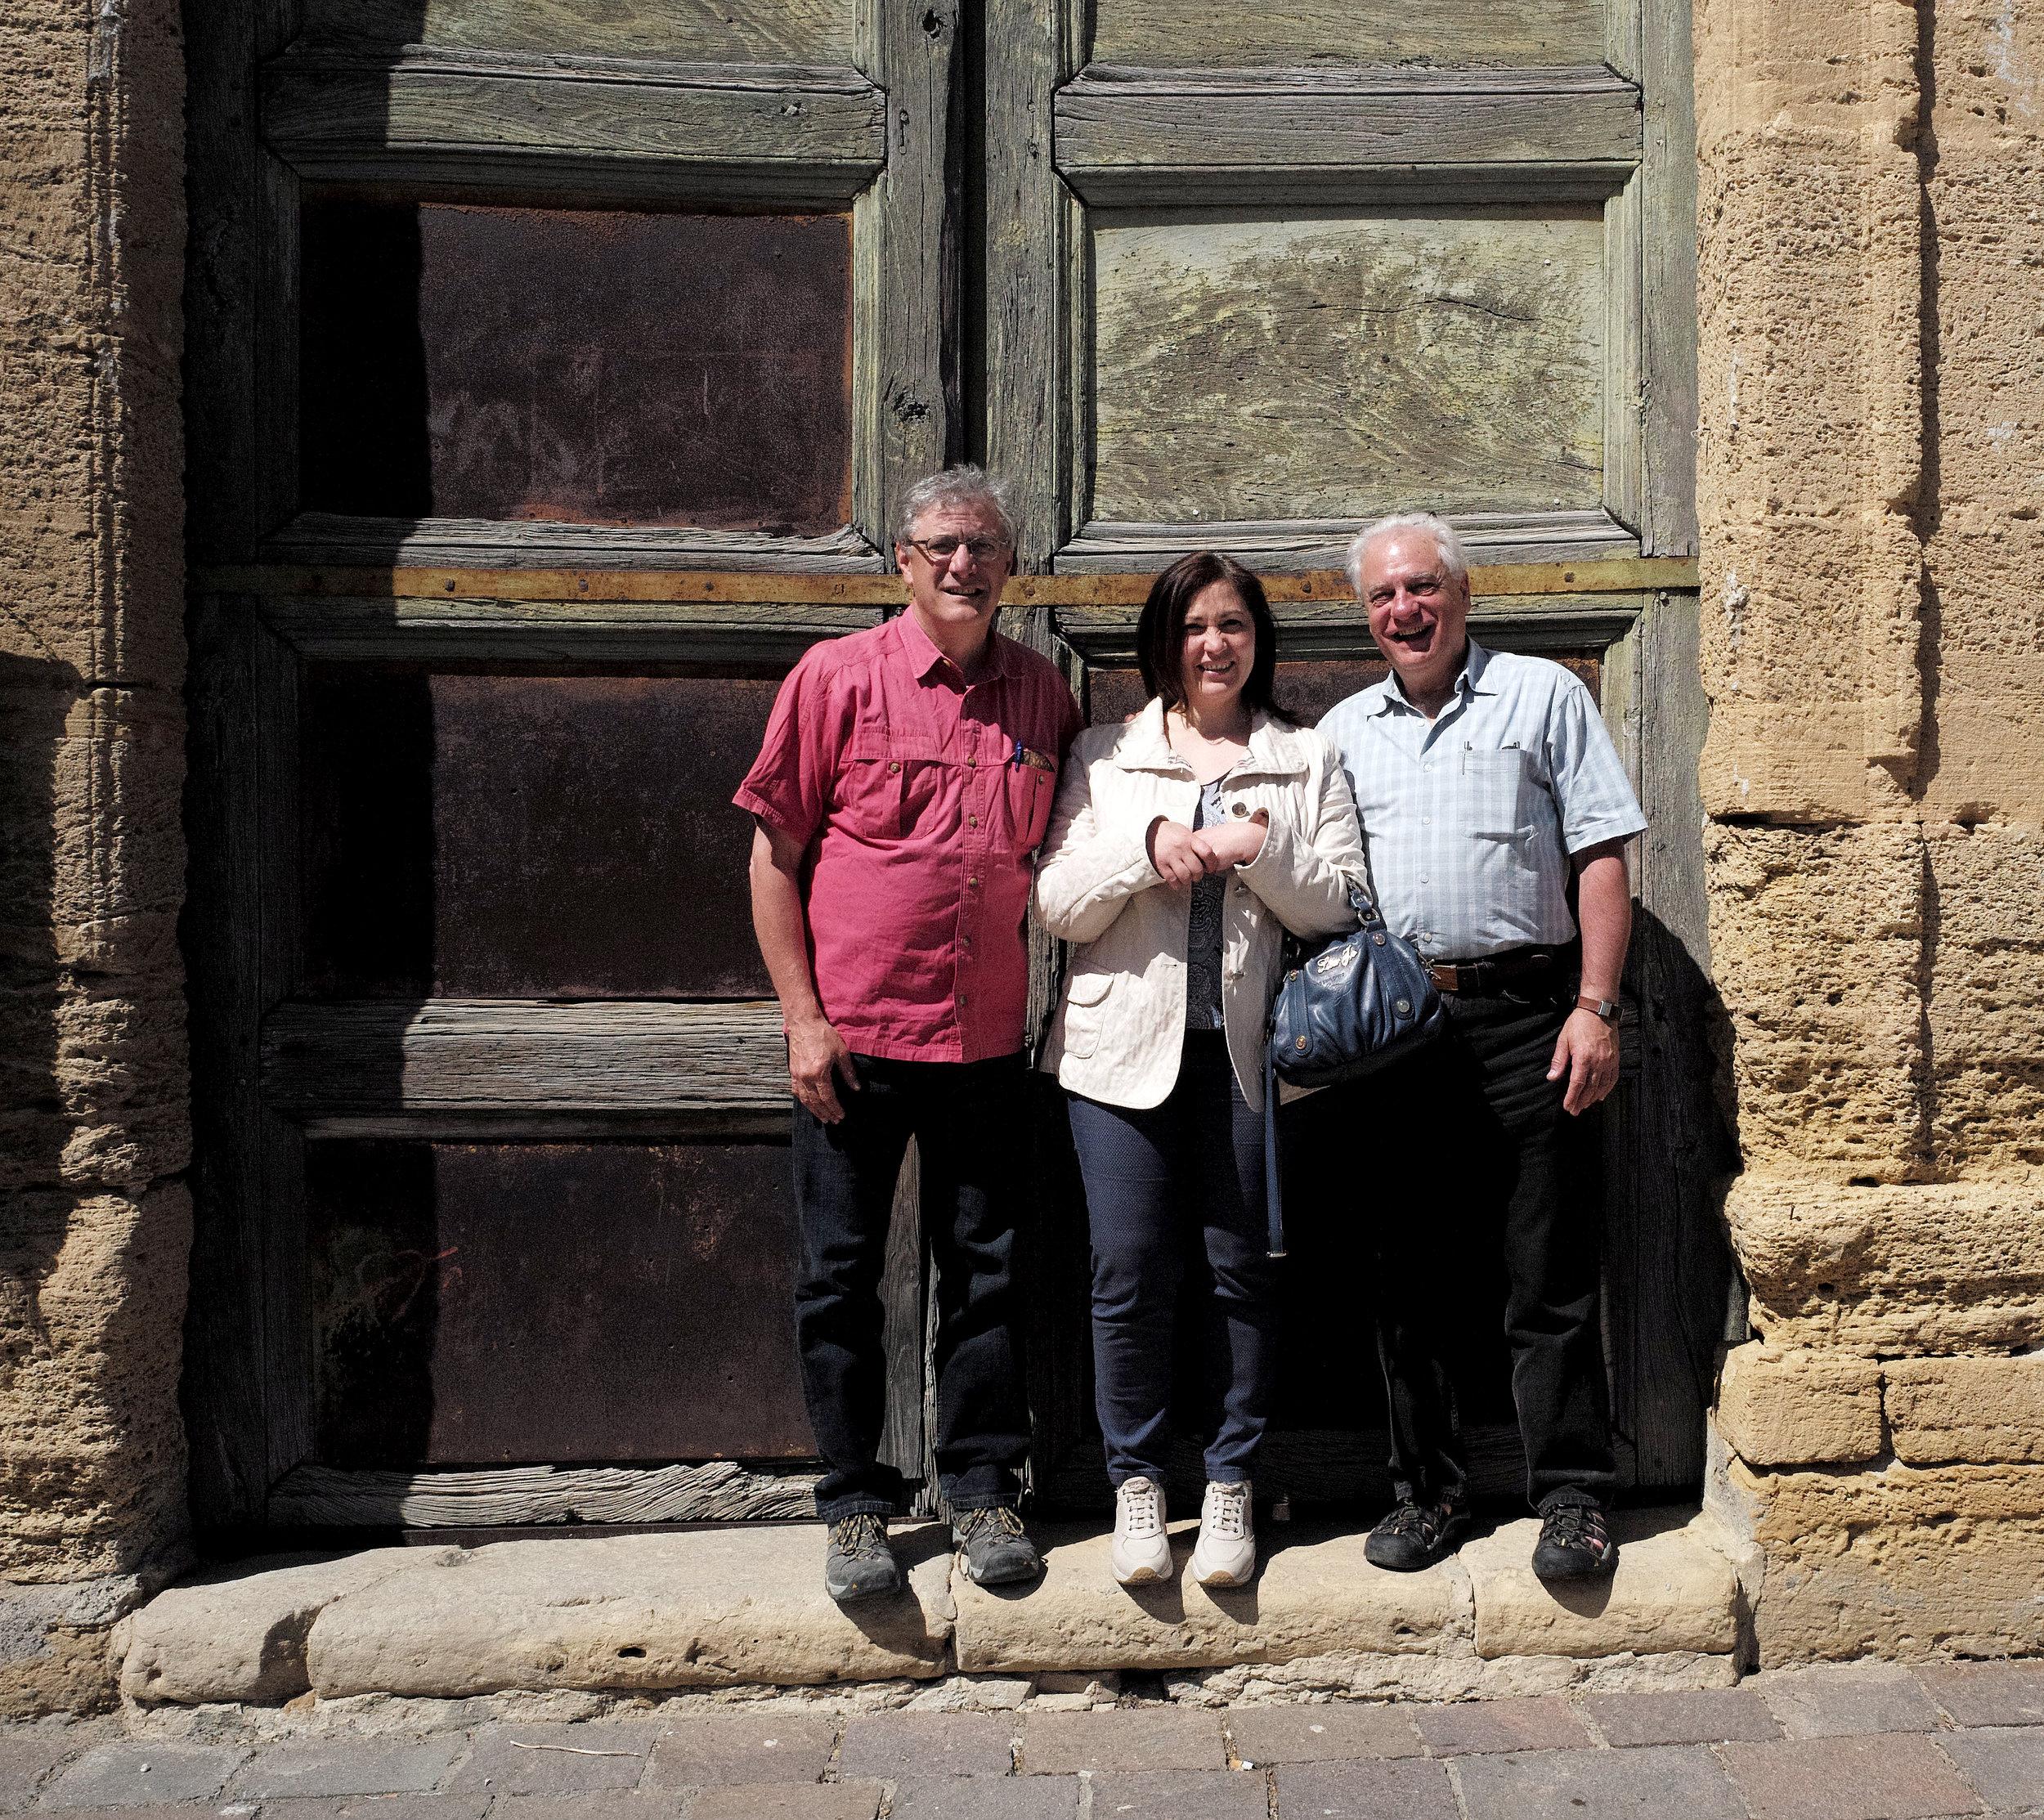 Paul Marotta, Vicenza Alba Biondo, Frank Marotta